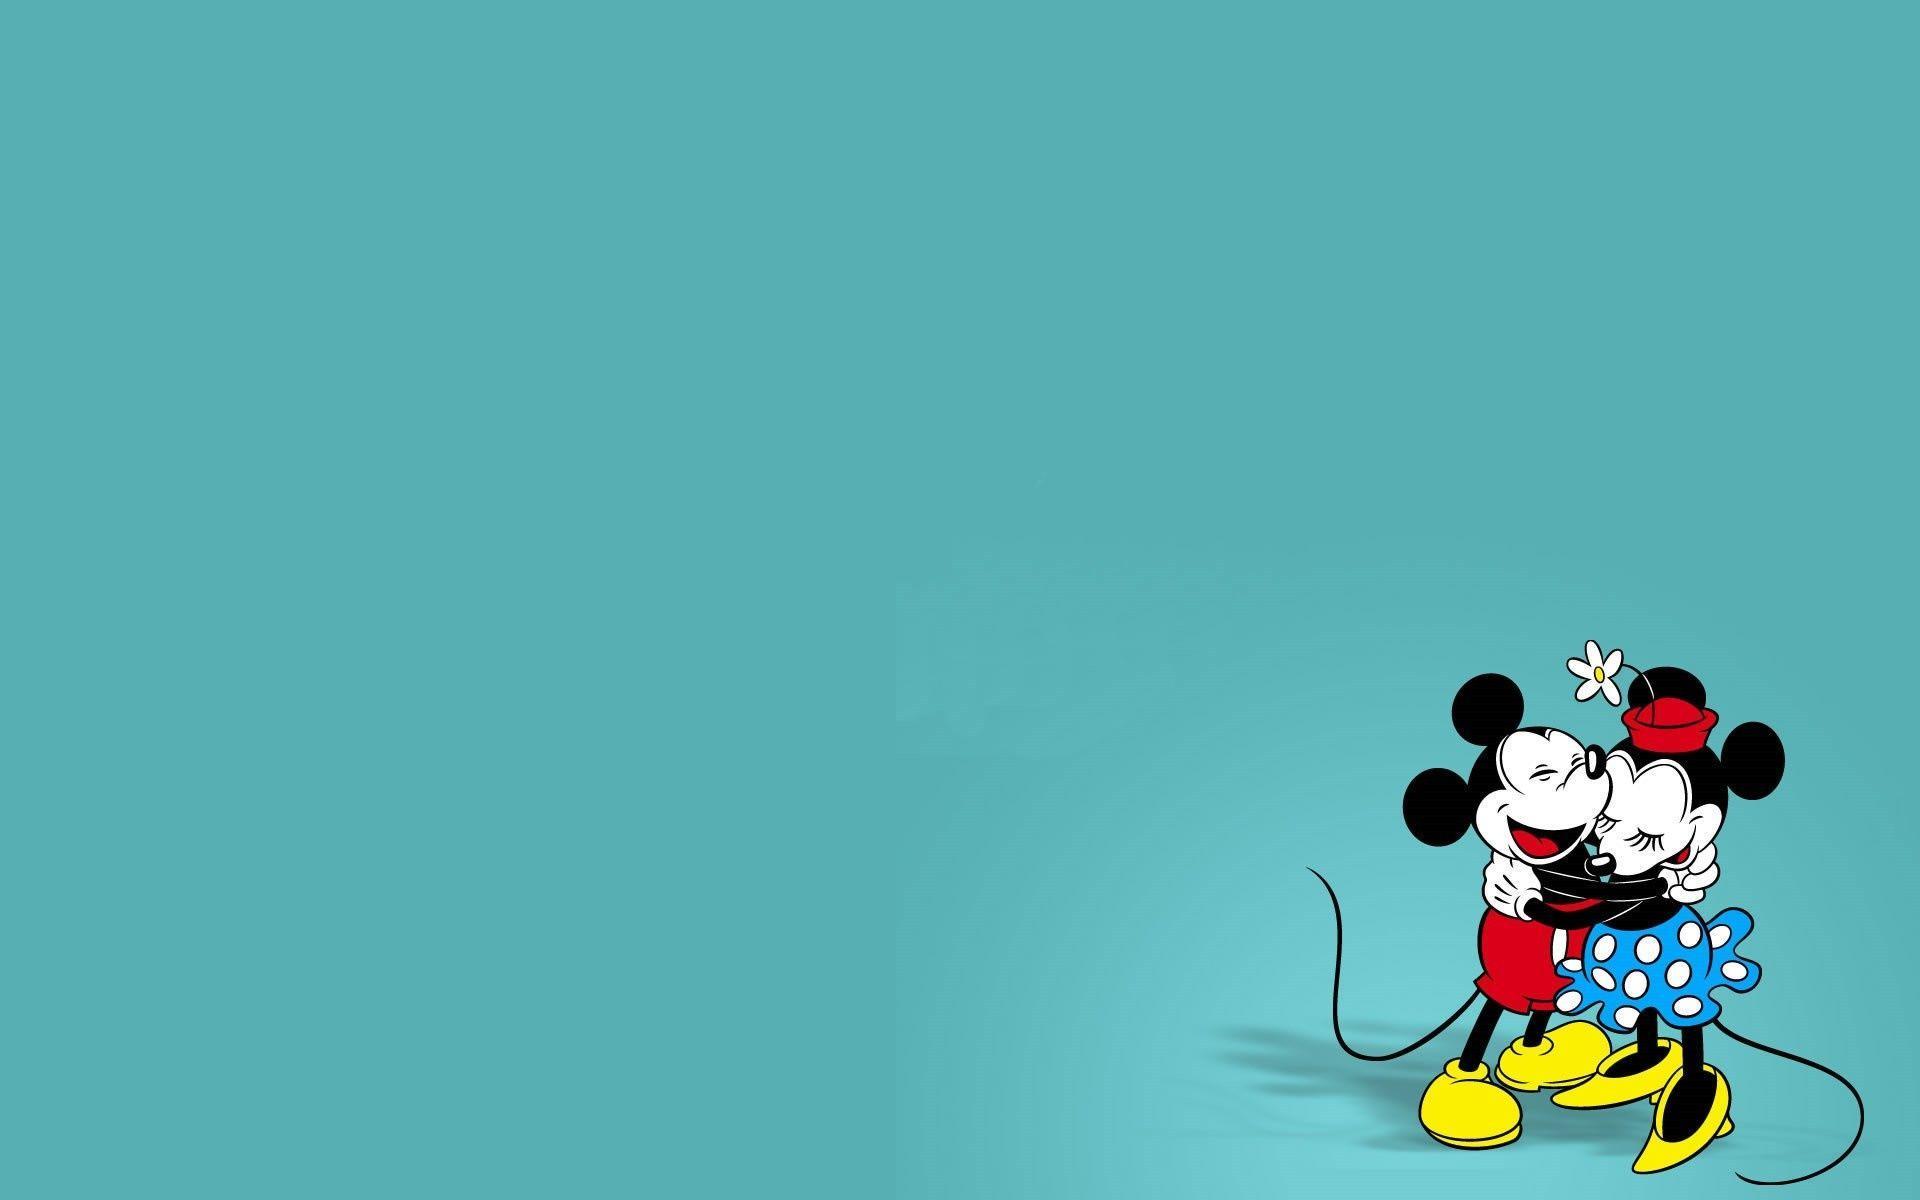 Vintage Minnie Mouse Laptop Wallpapers Top Free Vintage Minnie